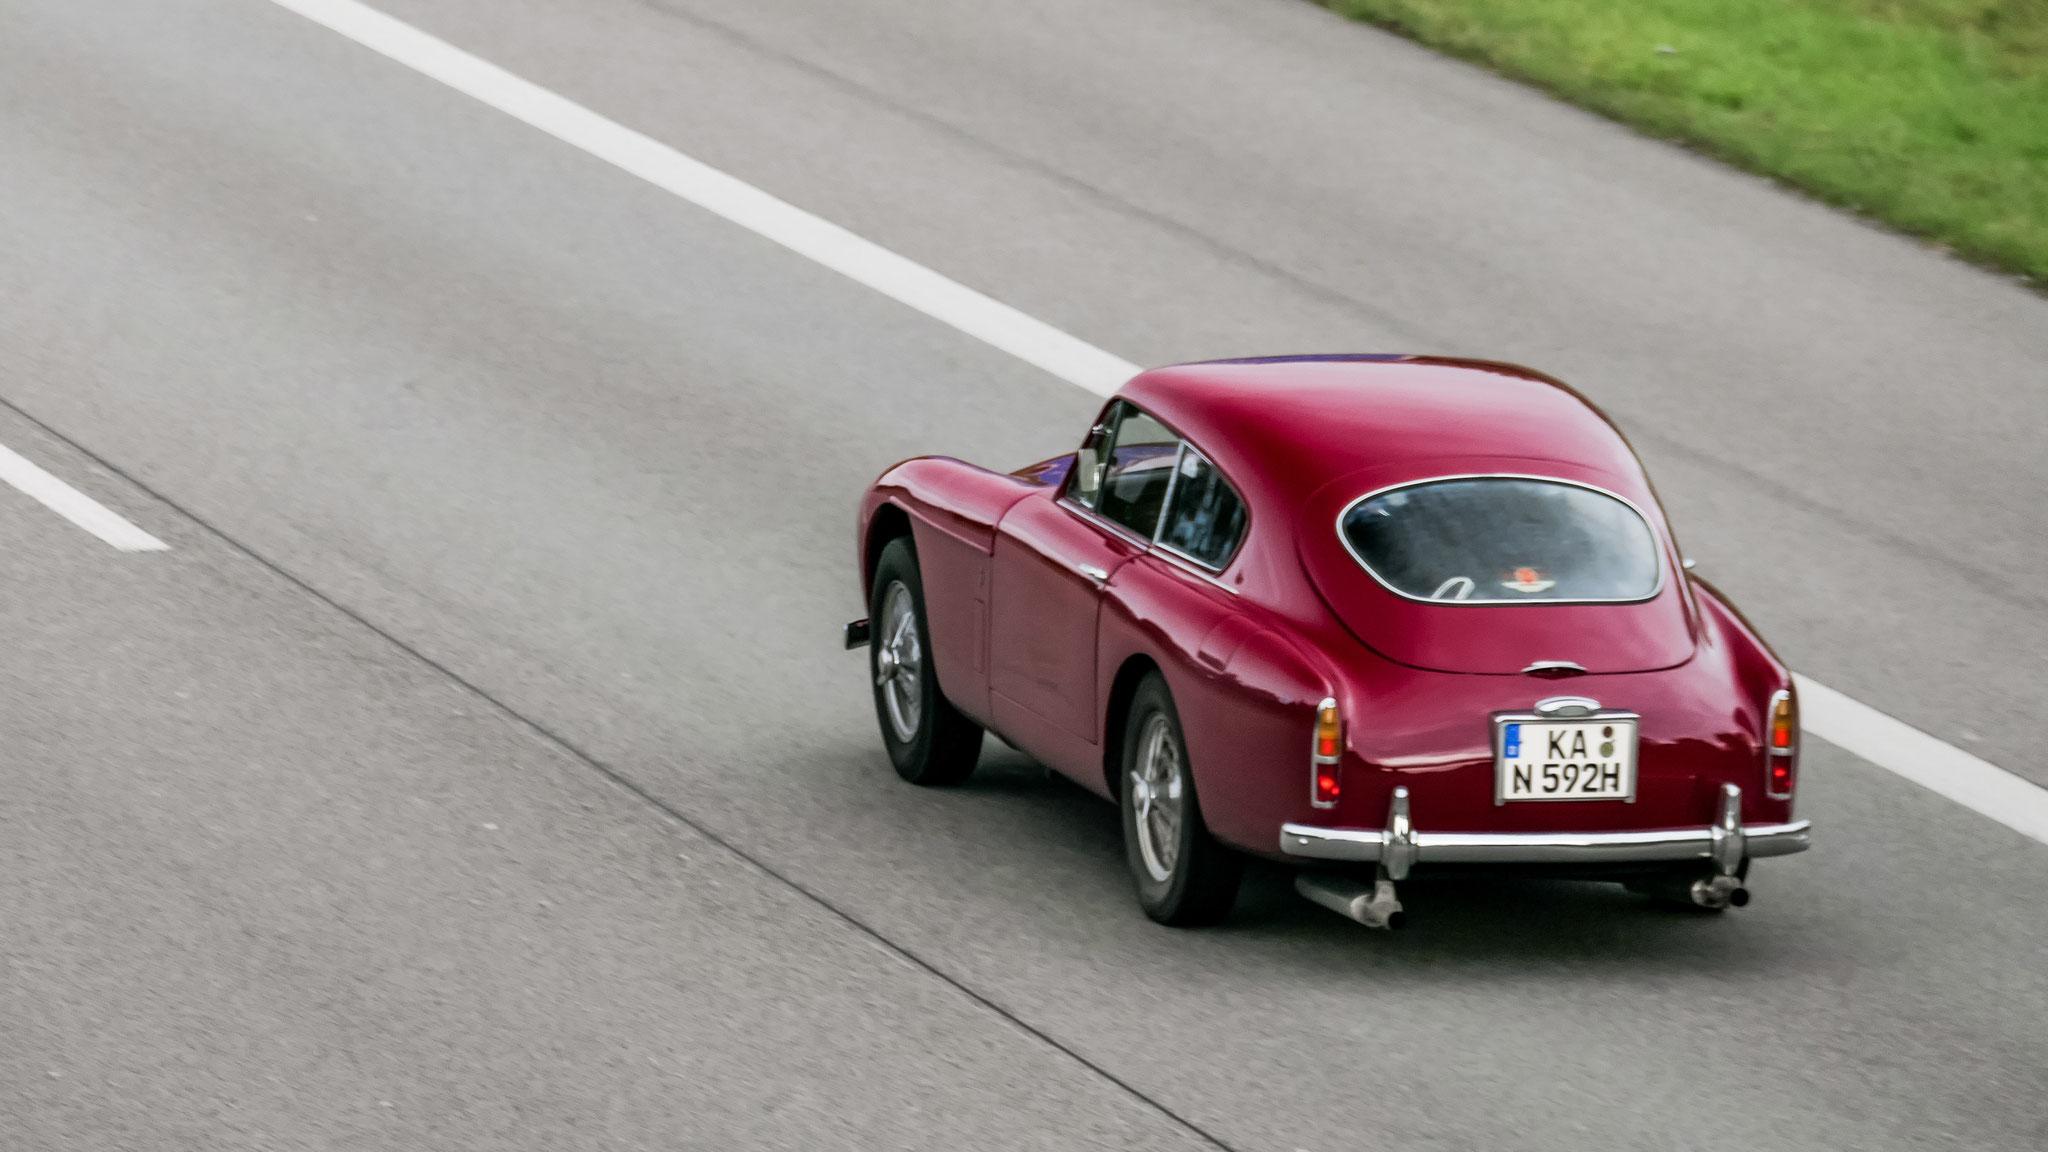 Aston Martin DB2/4 Mk III - KA-N-592H